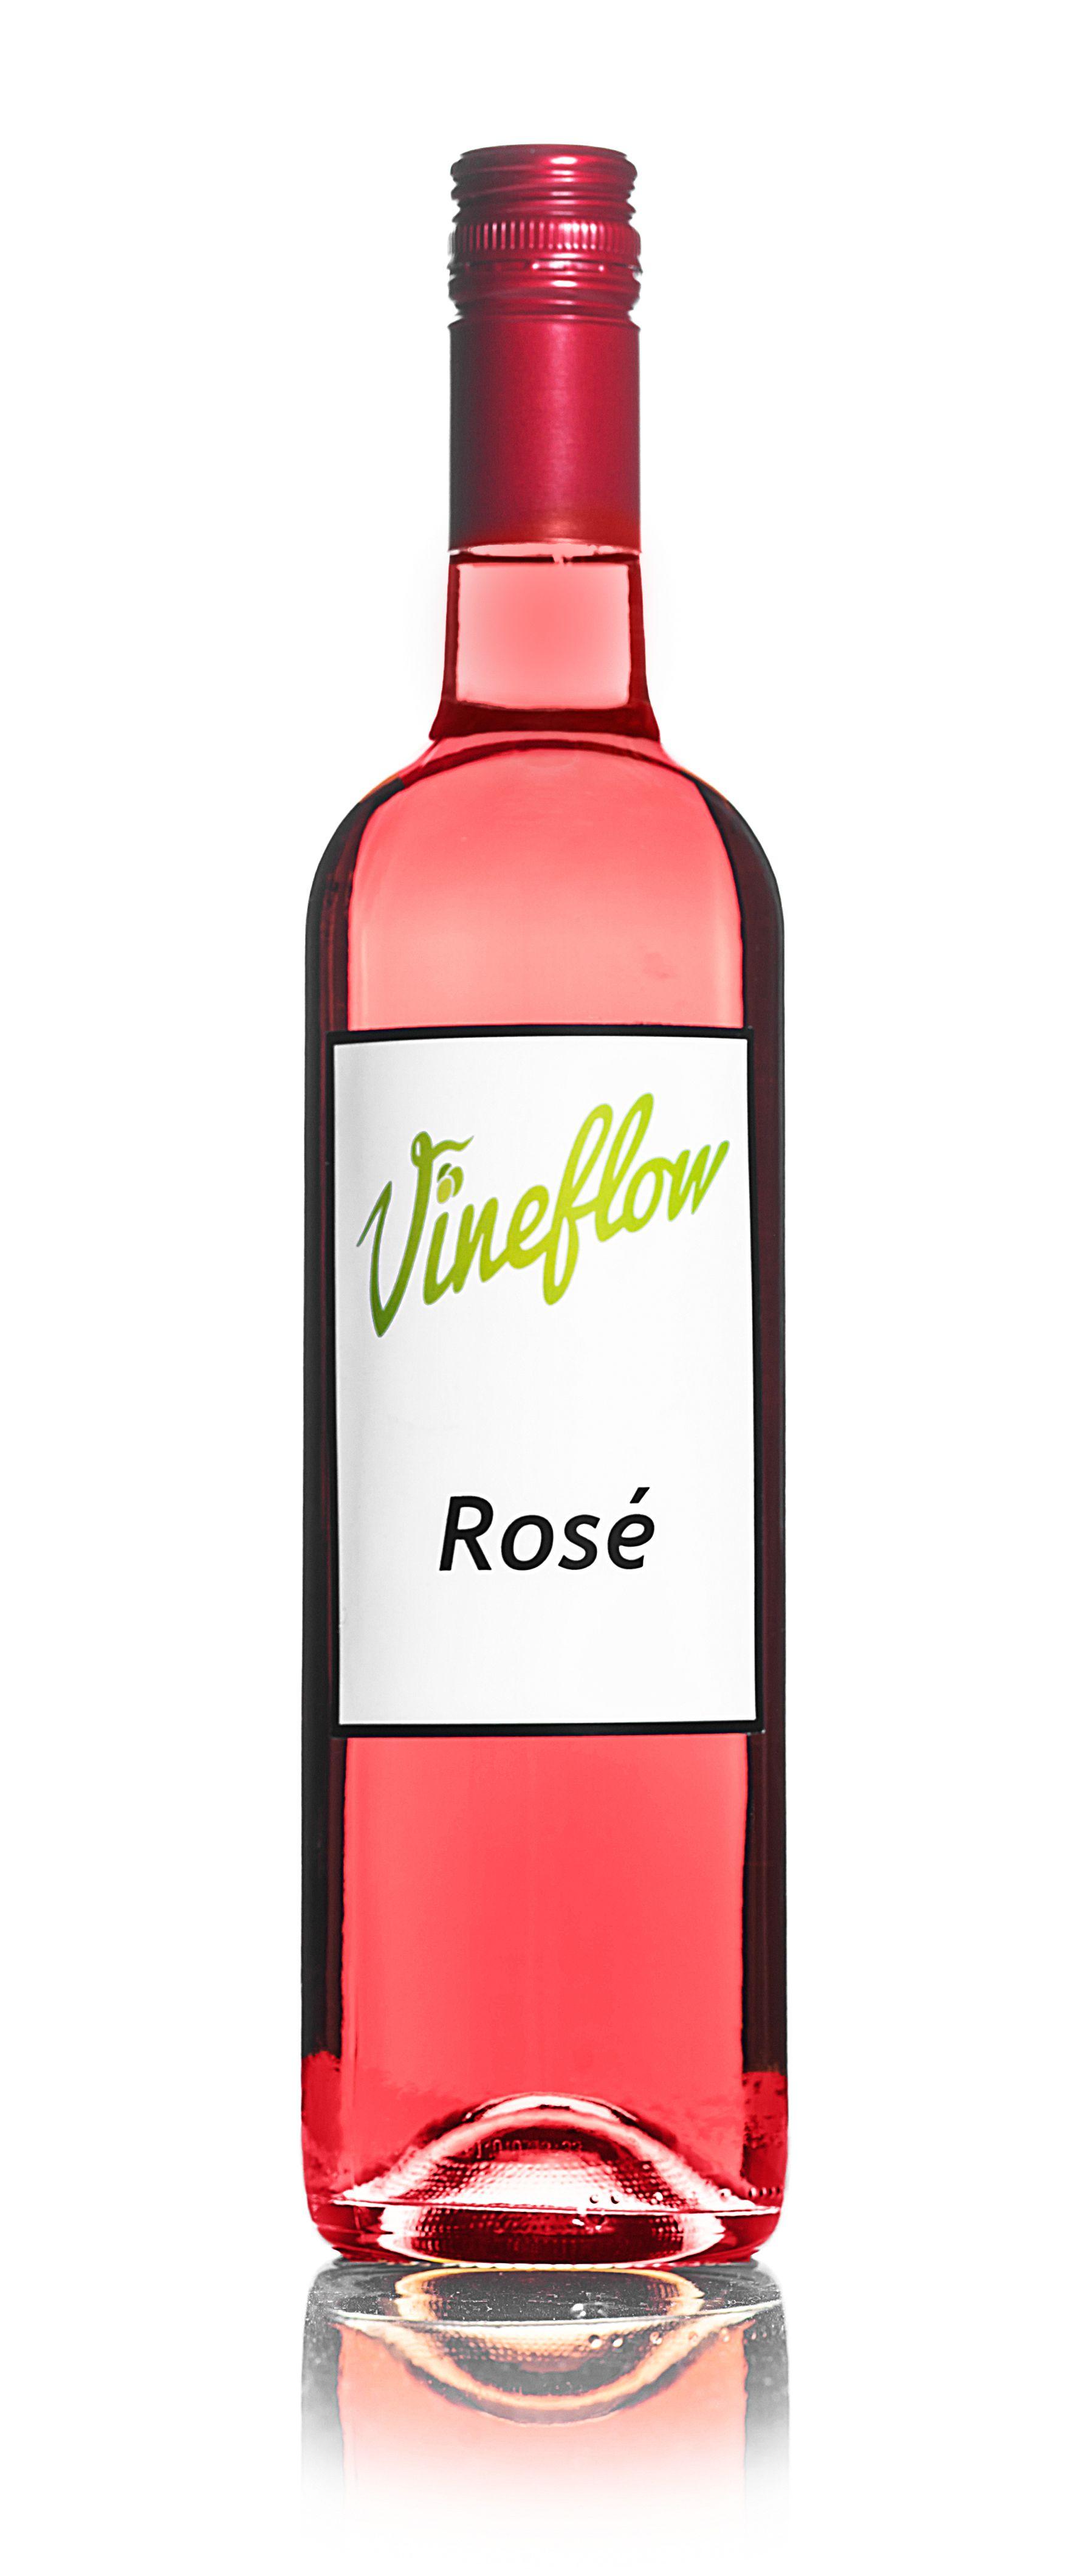 Rose Wine Bottle Rose Wine Bottle Rose Color